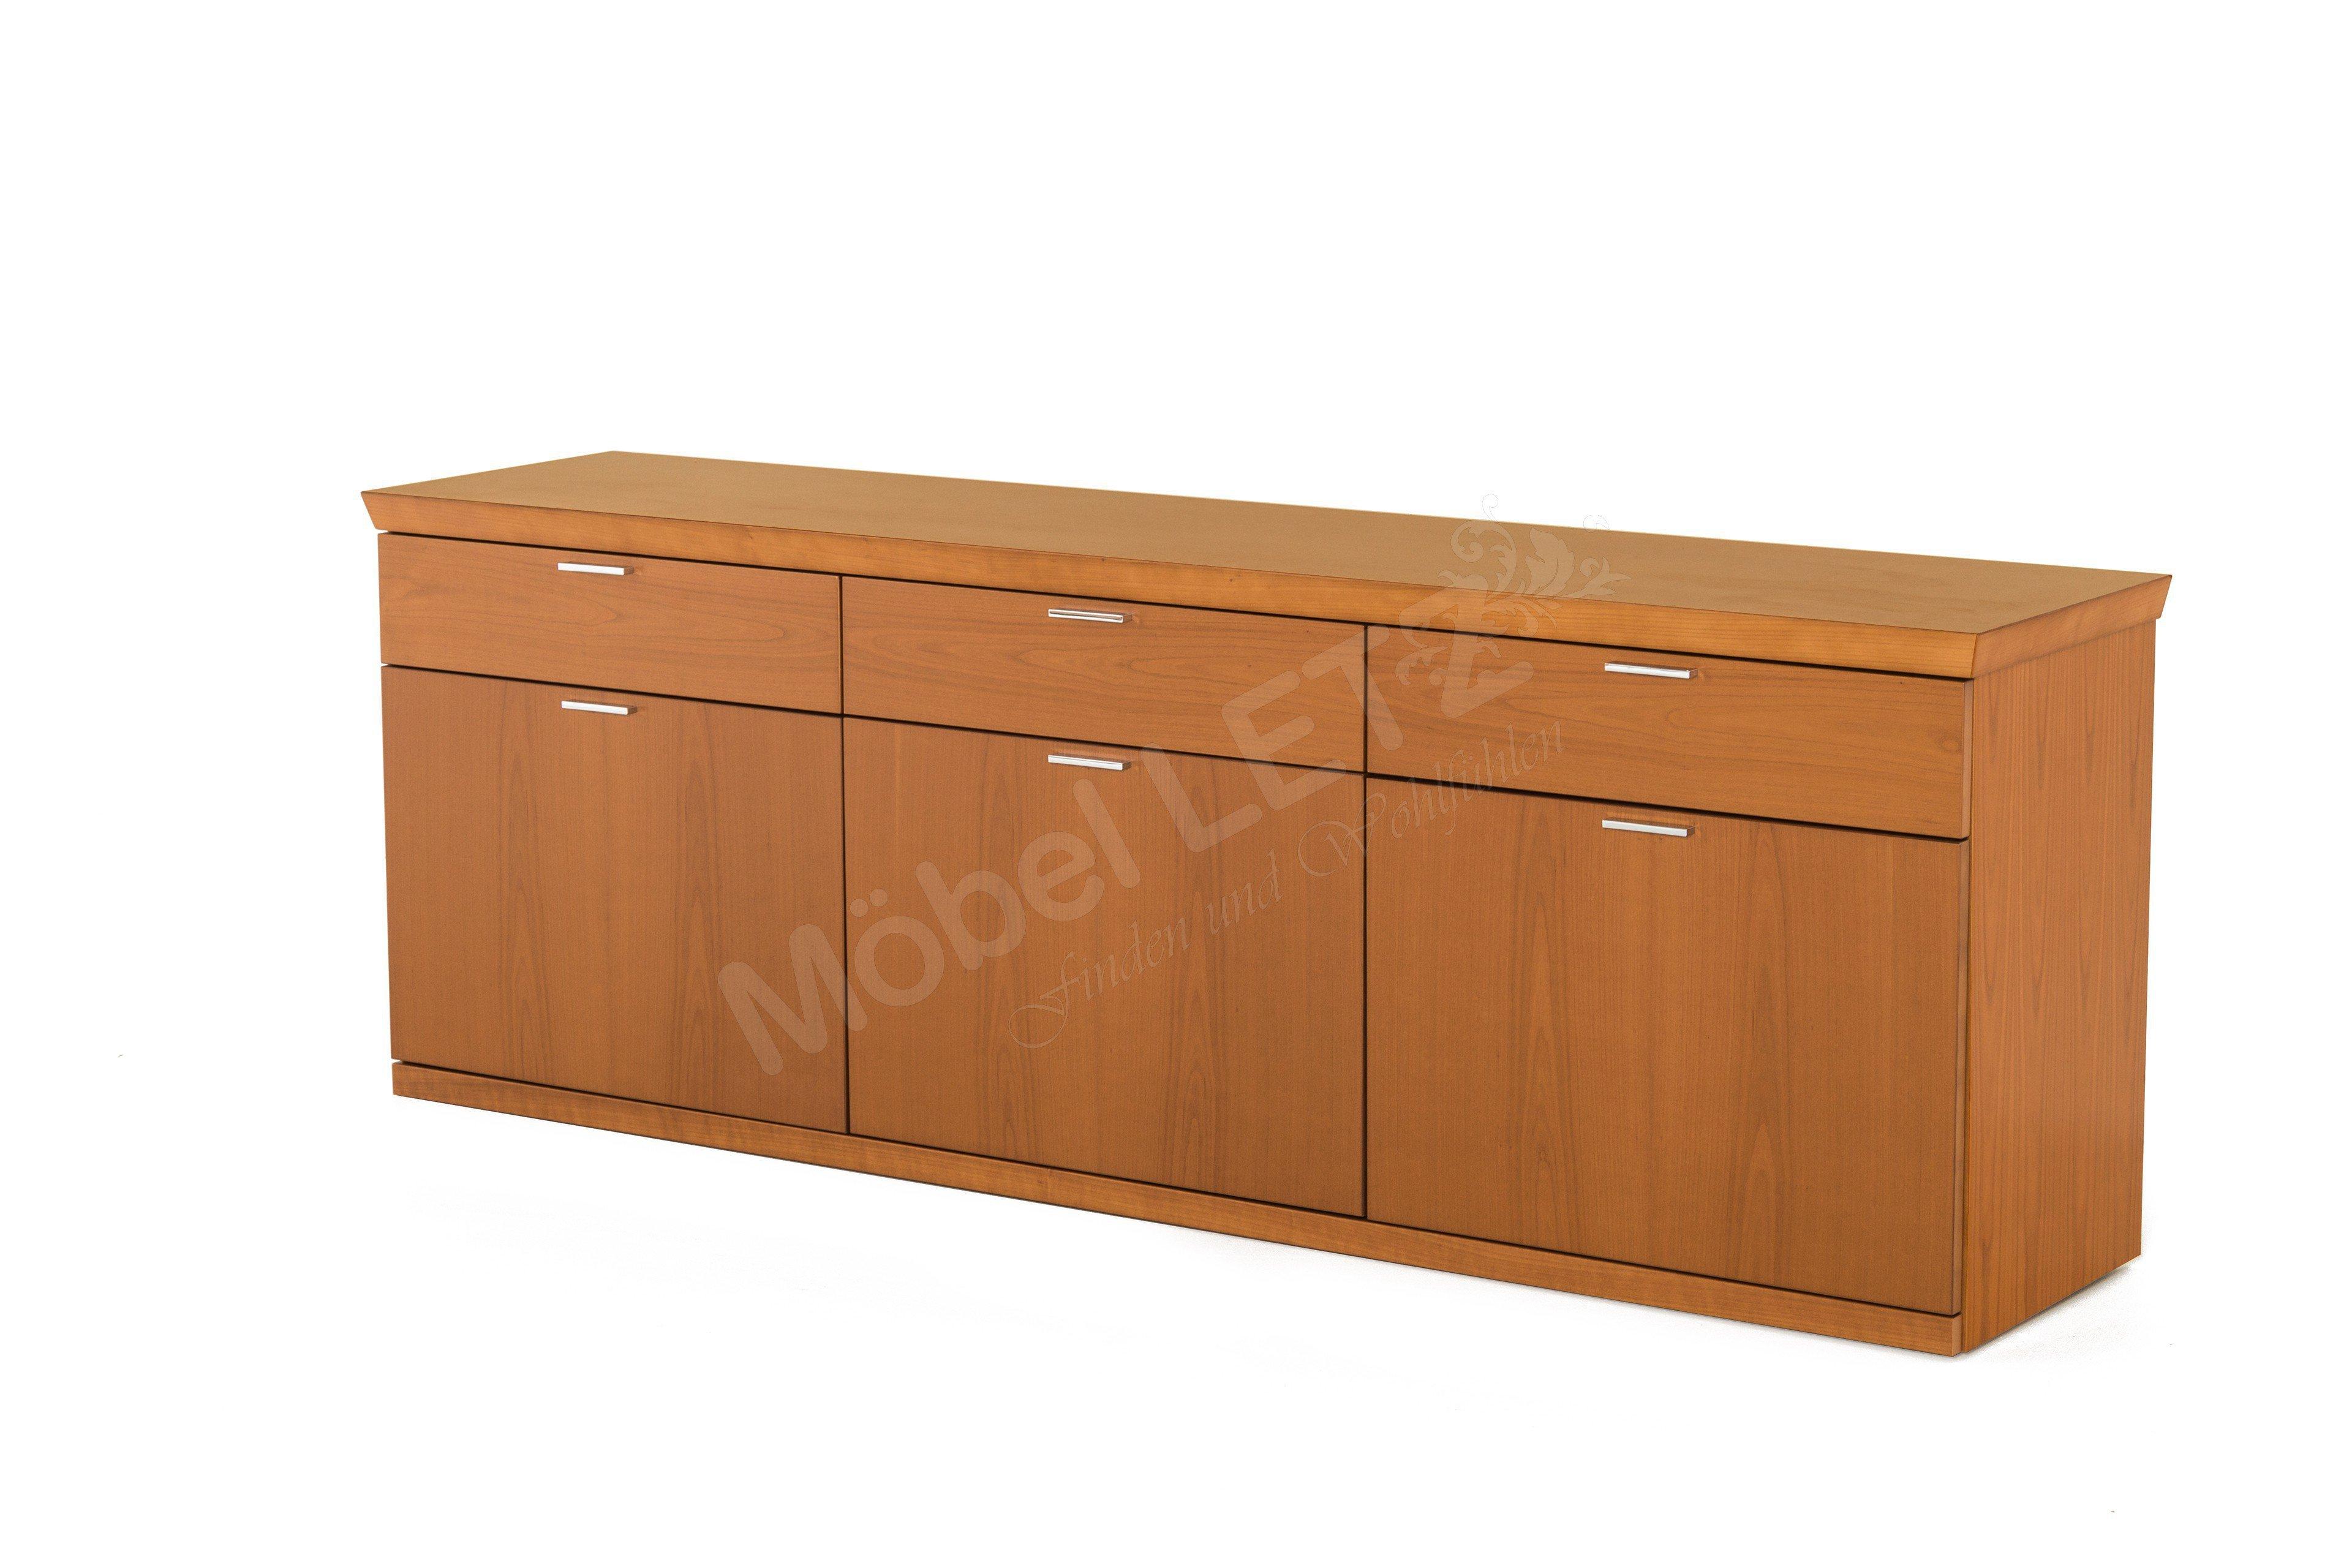 Kirschbaum Sideboard rietberger möbelwerke sideboard kirschbaum furniert möbel letz